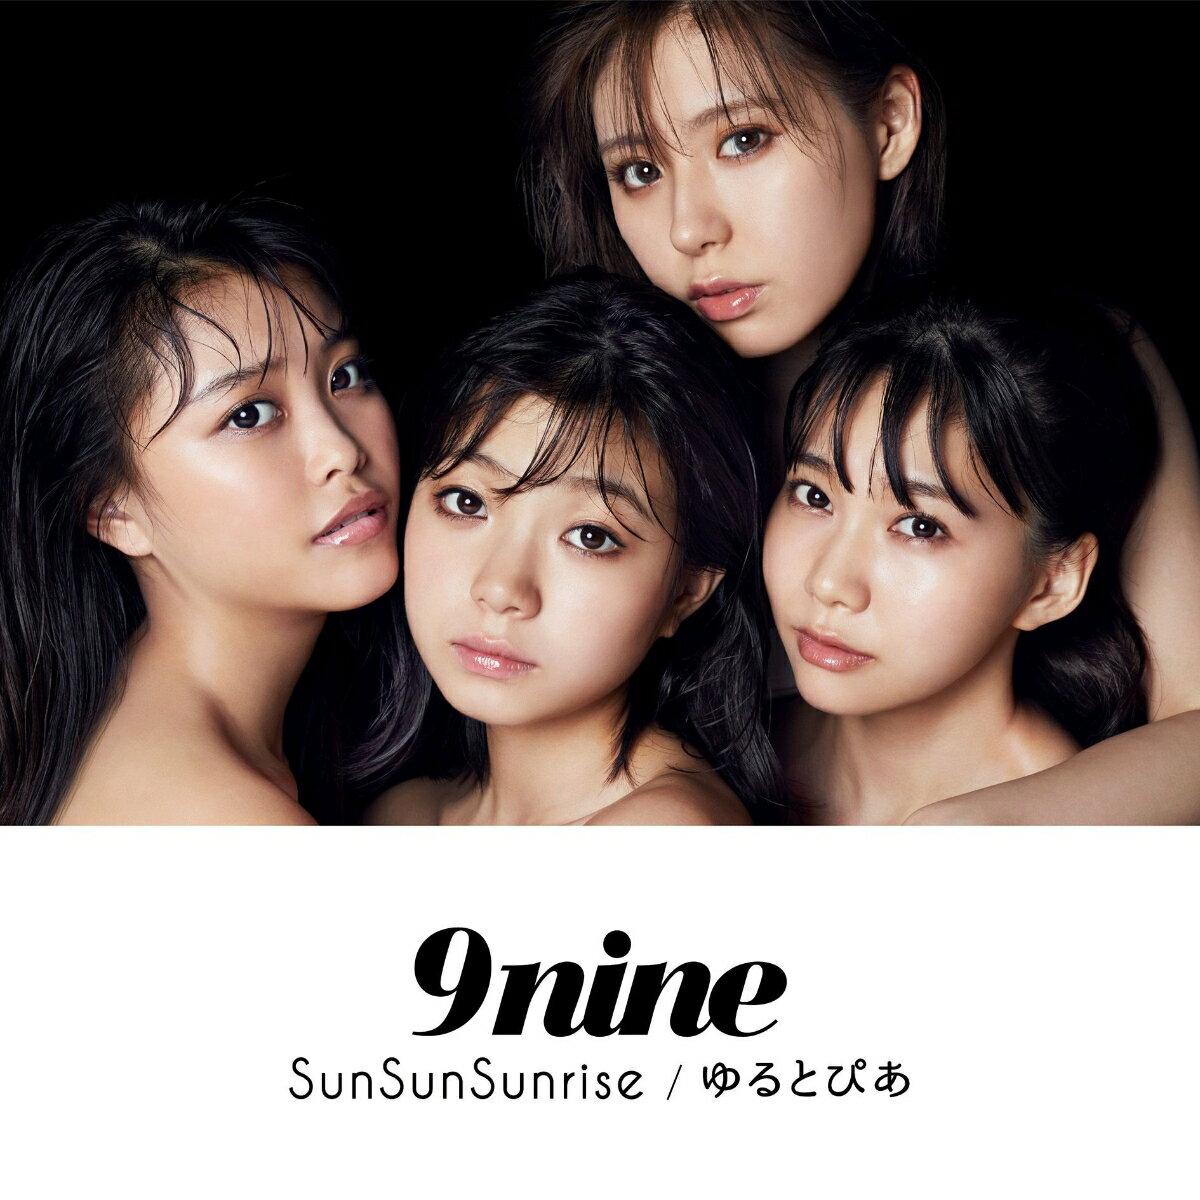 SunSunSunrise/ゆるとぴあ (初回限定盤 CD+DVD) [ 9nine ]